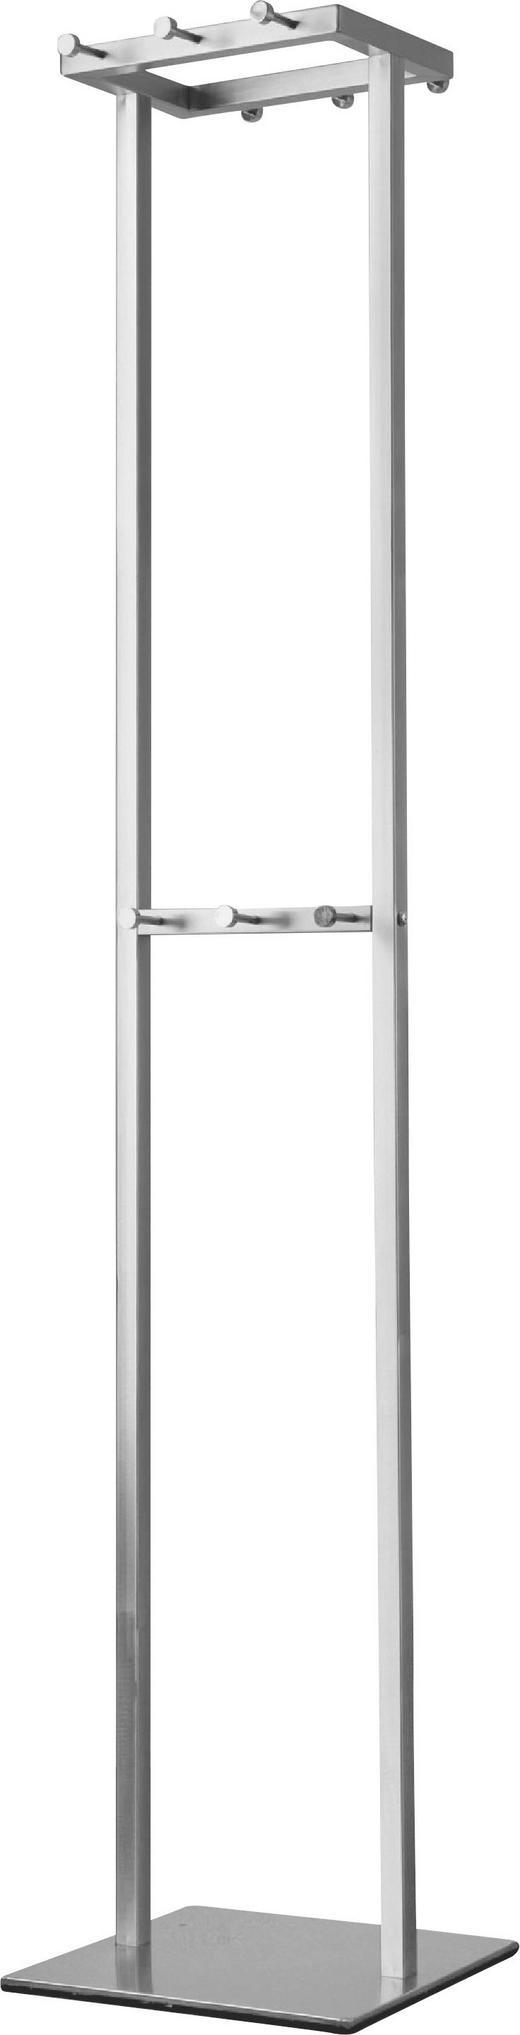 GARDEROBENSTÄNDER Edelstahlfarben - Edelstahlfarben, Design, Metall (35/176/35cm)